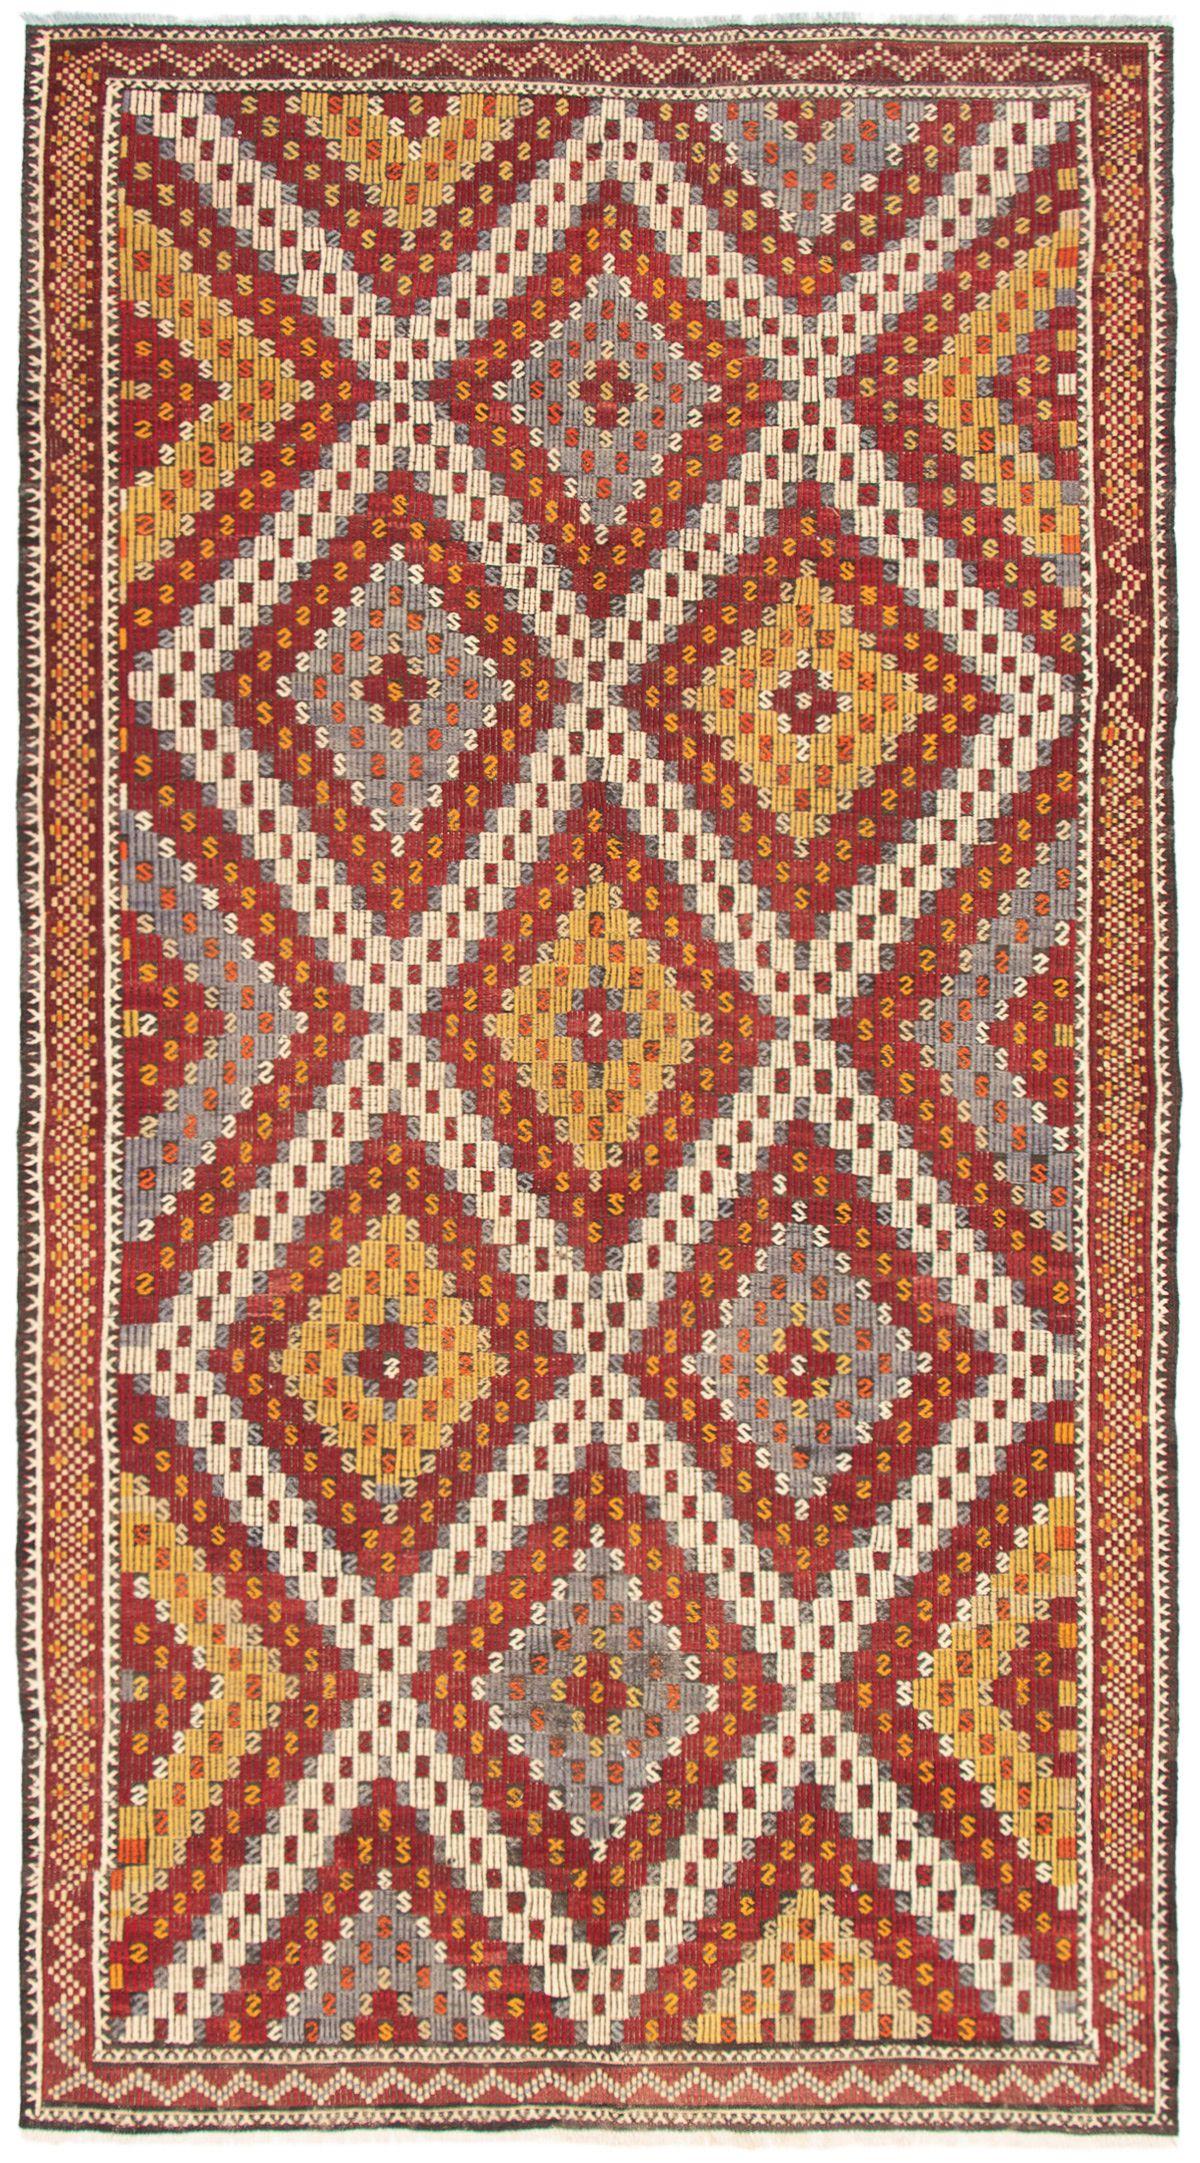 "Hand woven Yoruk Dark Red Wool Tapestry Kilim 6'3"" x 11'6"" Size: 6'3"" x 11'6"""